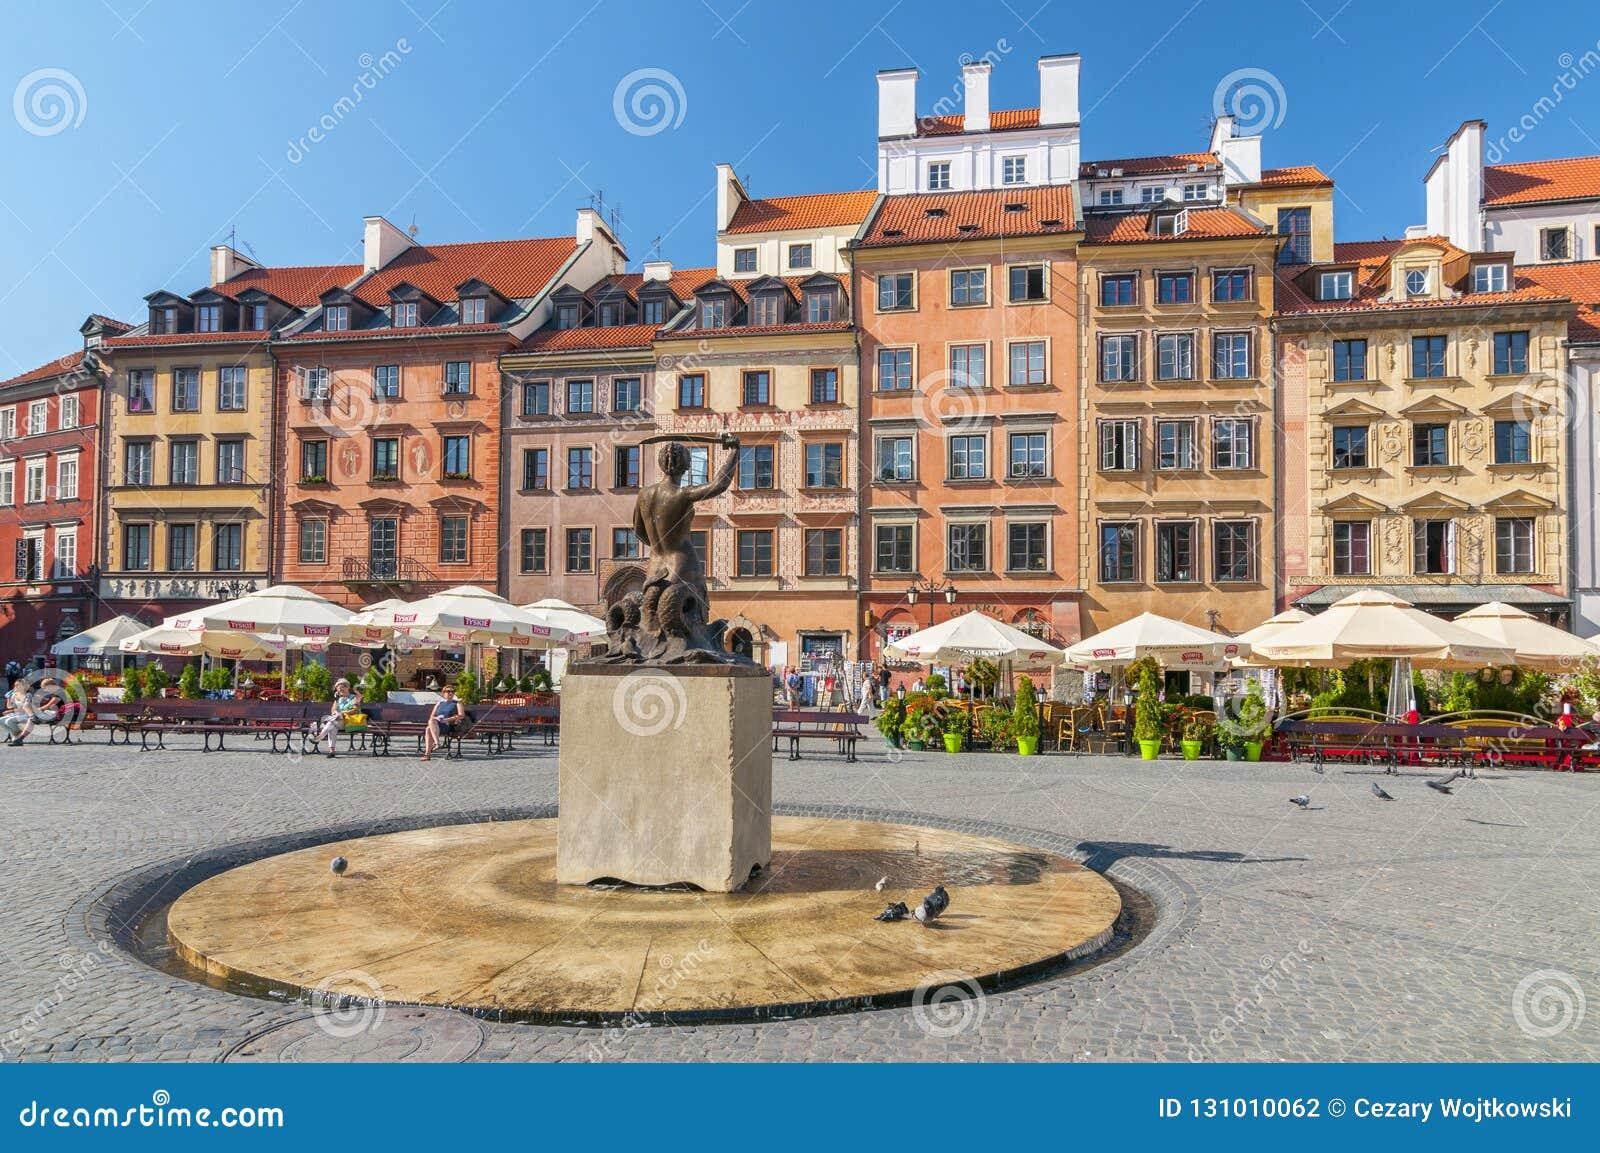 La estatua de la sirena en el centro de la ciudad vieja de Varsovia en Varsovia, Polonia